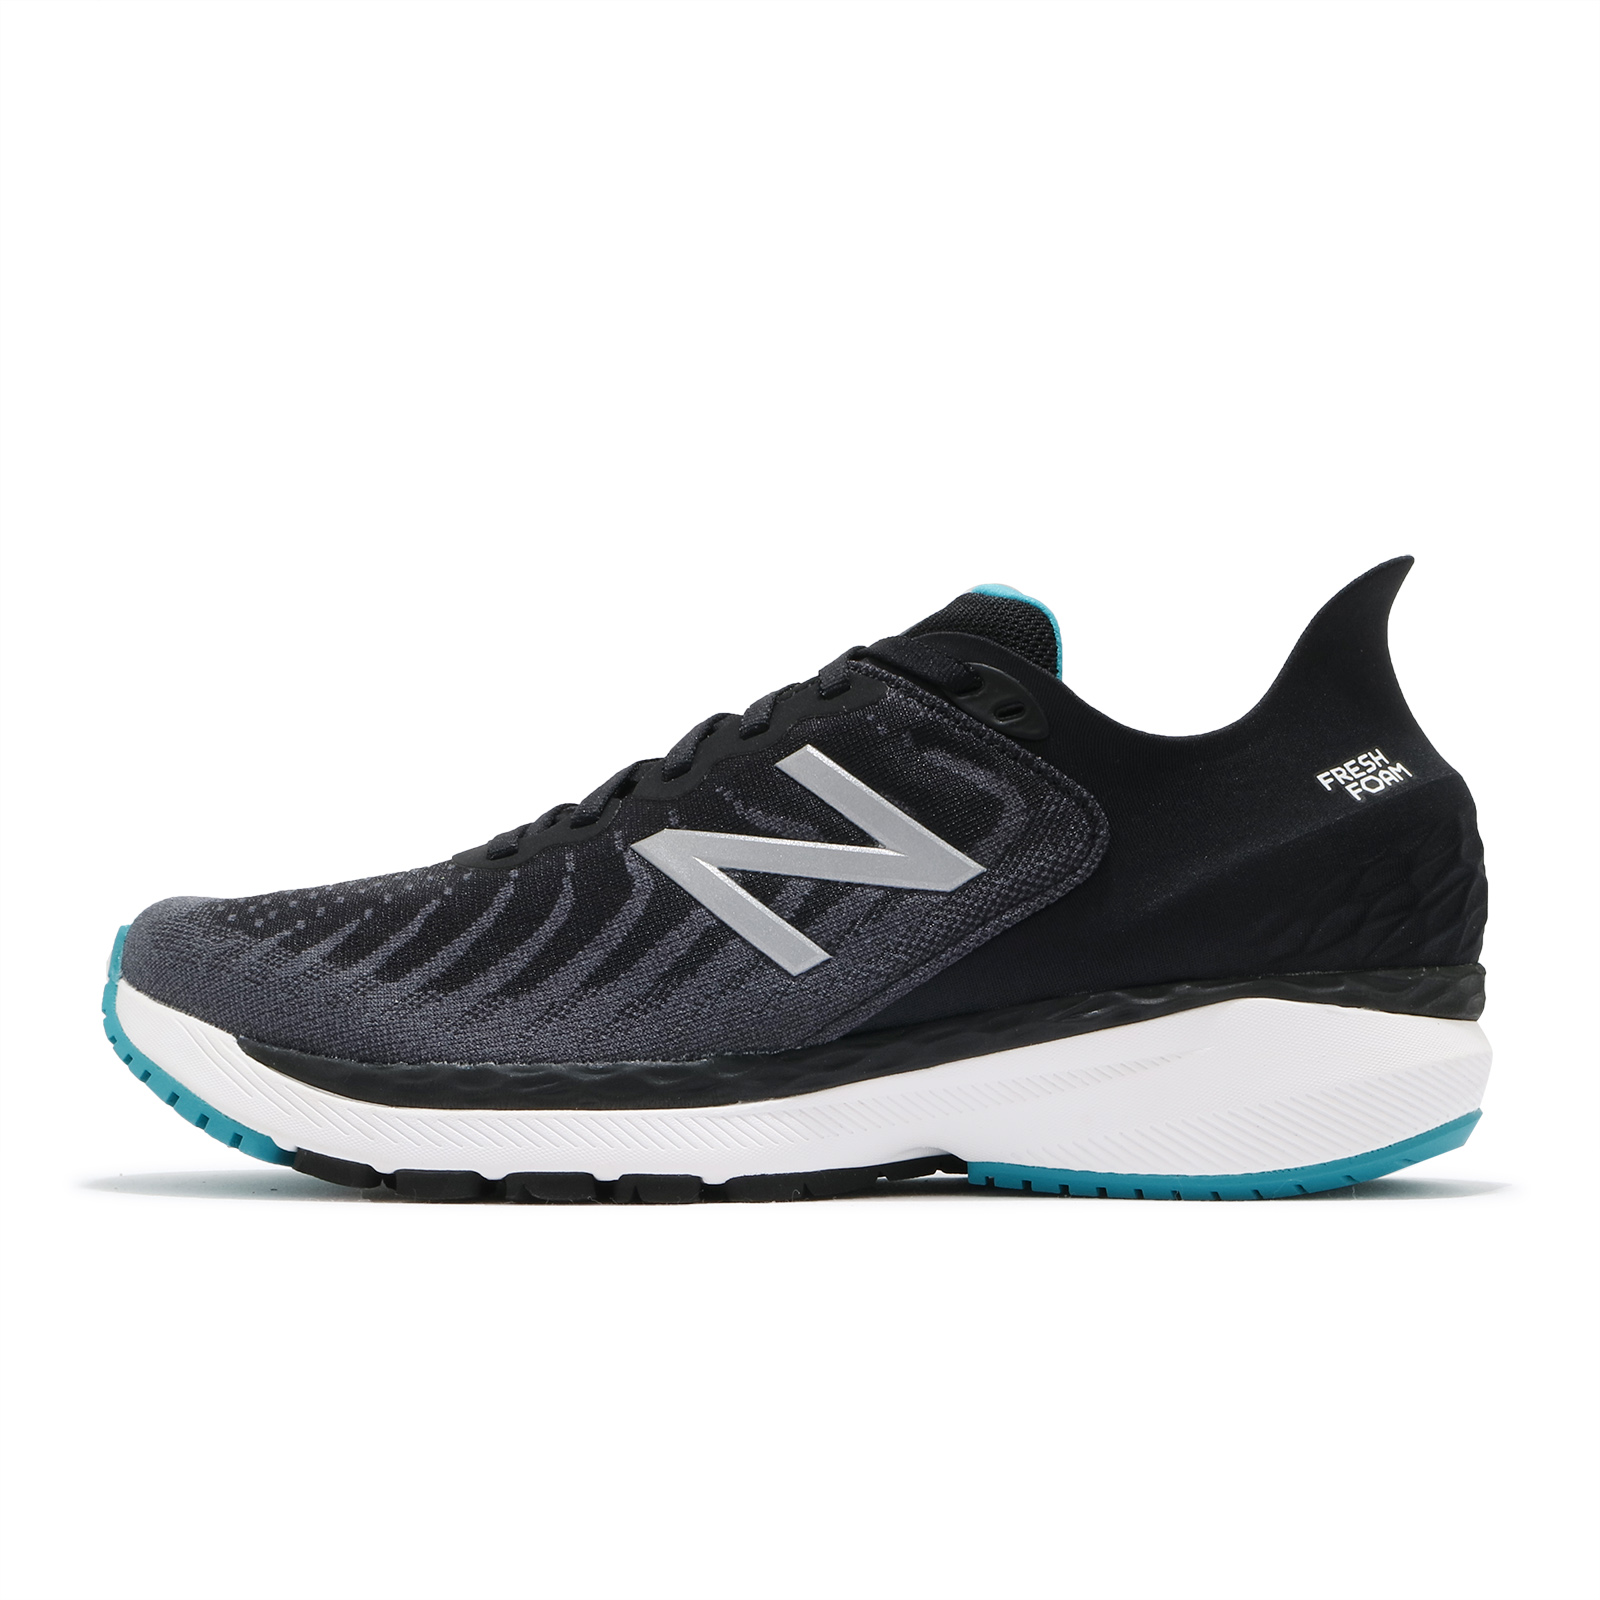 New Balance 慢跑鞋 860 超寬楦 男 支撐型 黑 銀 路跑 馬拉松 運動鞋【ACS】 M860N114E